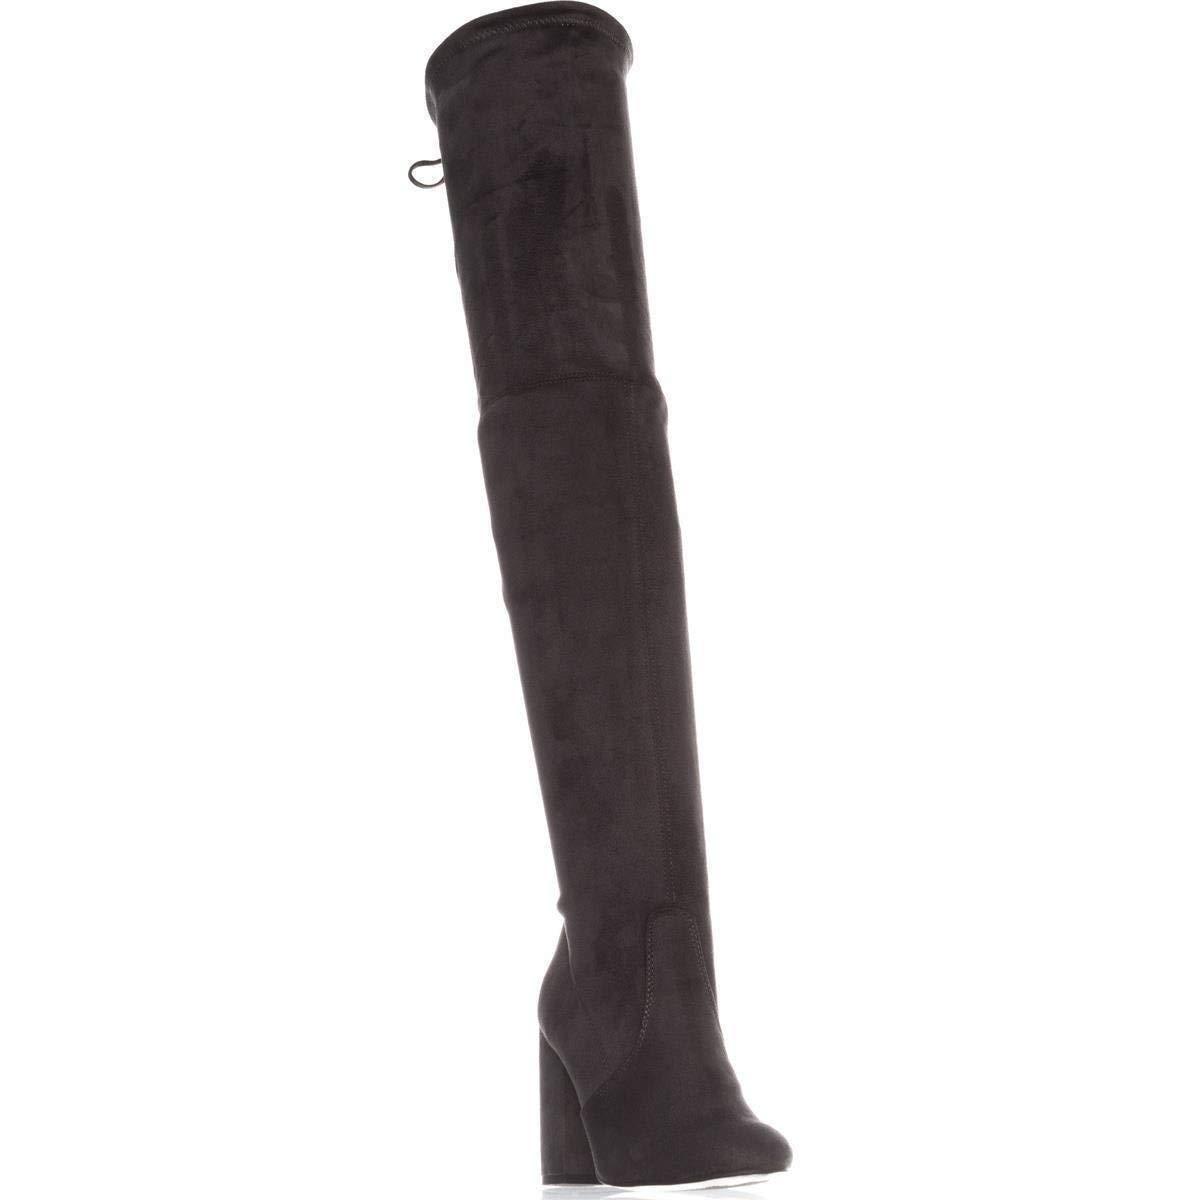 Steve Steve Steve Madden Para Mujer Norri estiramiento cubierto al muslo botas Altas, gris, Talla 11.0 c48810